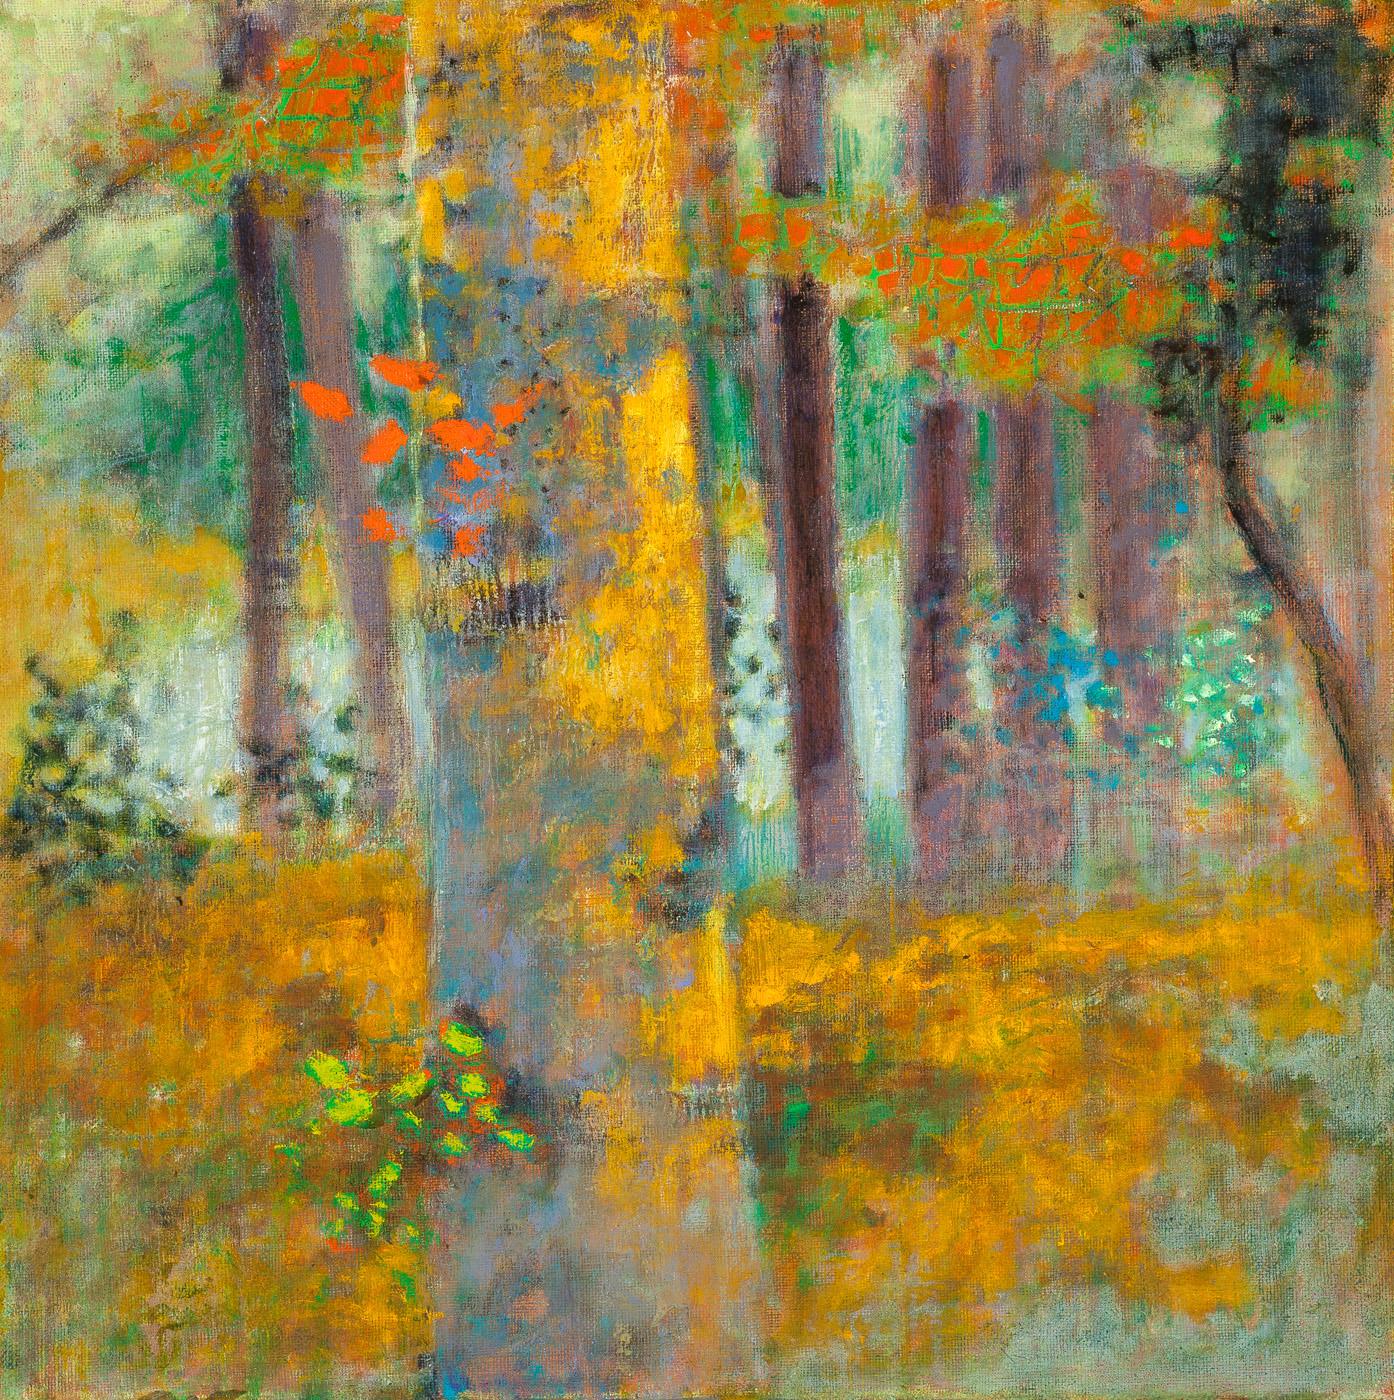 "Graceful Confrontation   | oil on linen | 14 x 14"" | 2014"